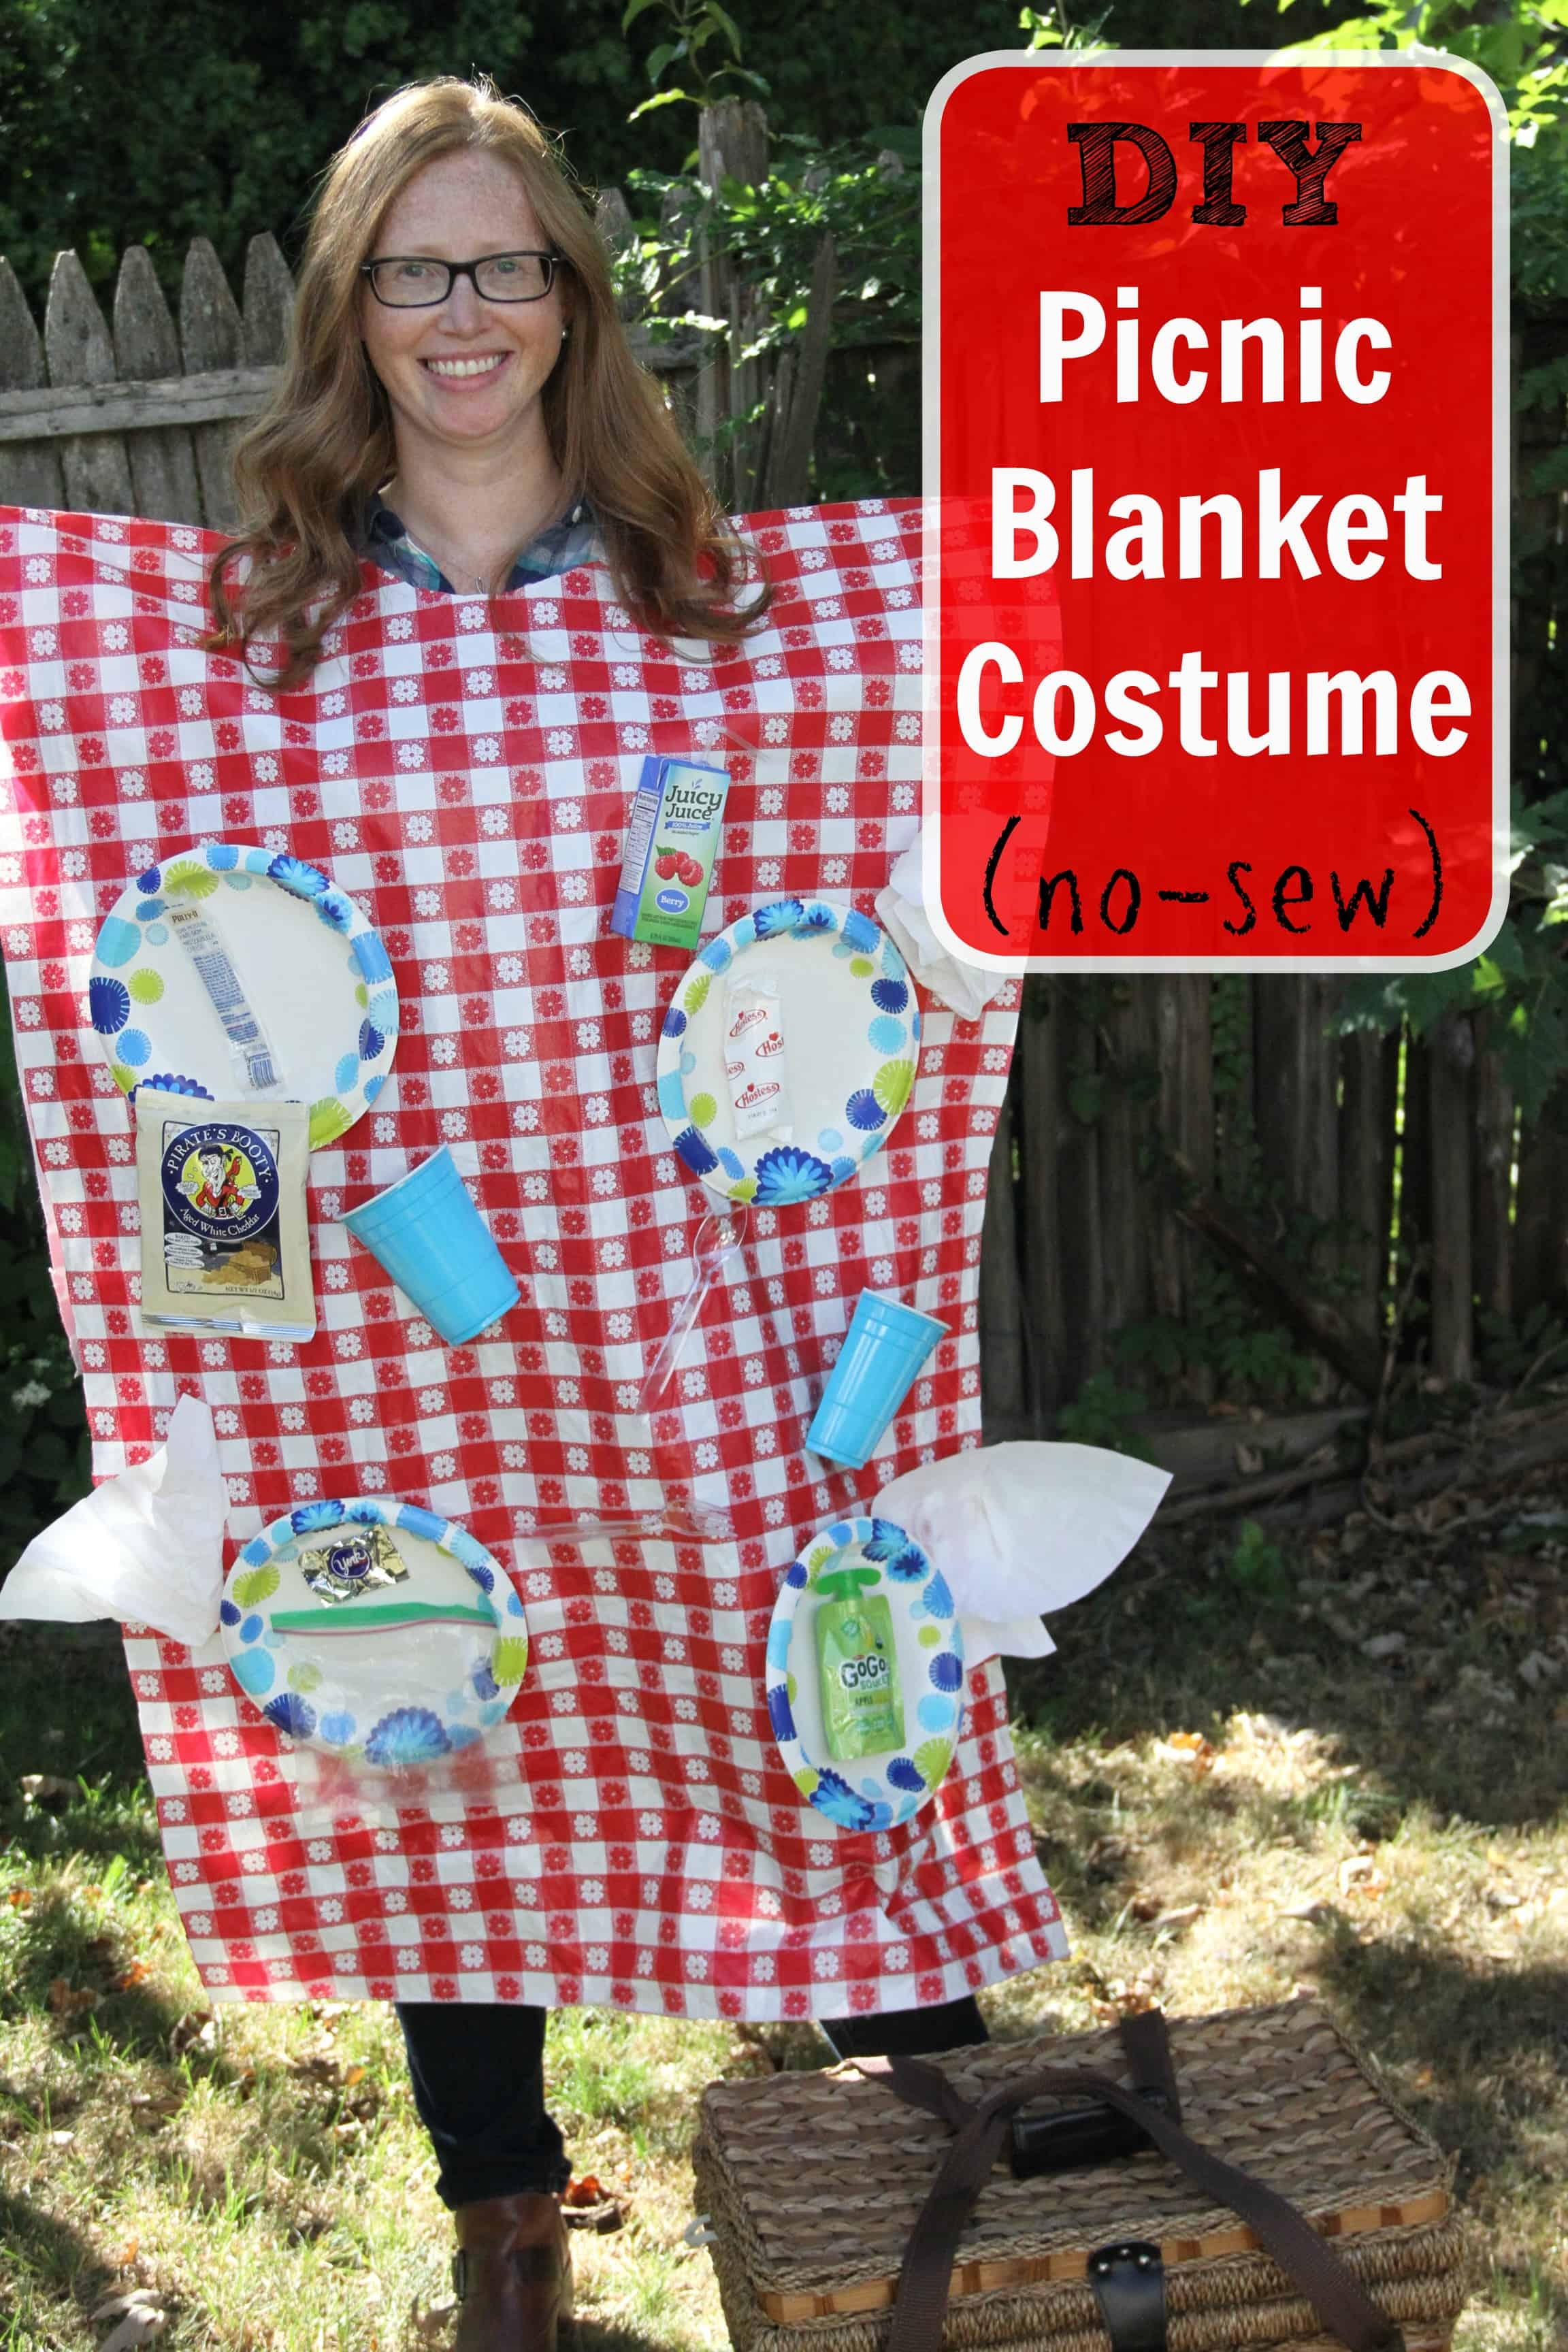 DIY Picnic Blanket Costume no-sew